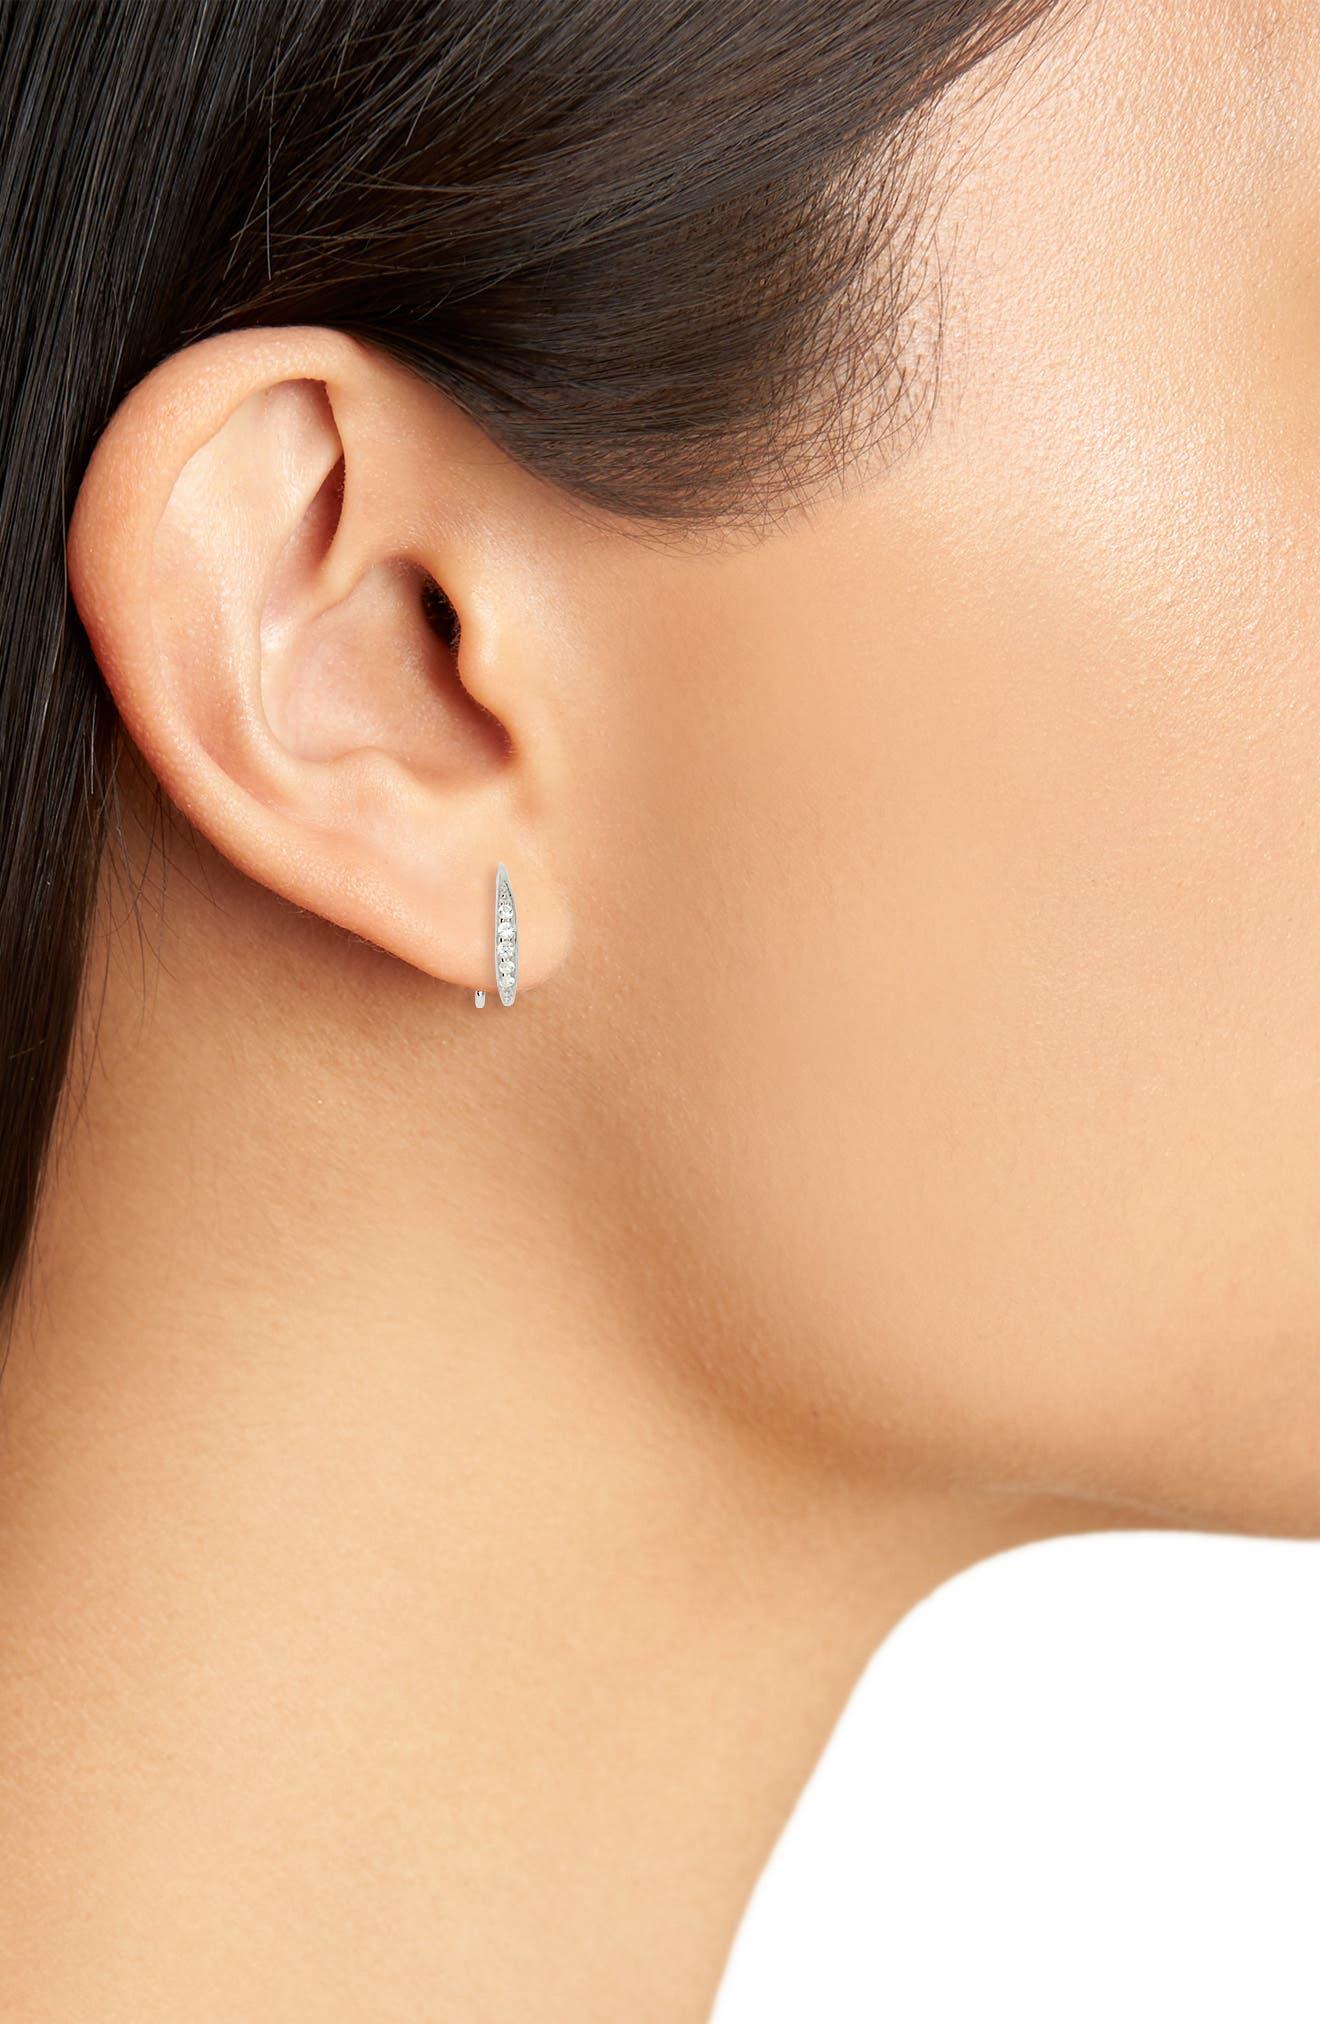 Mini Ear Loop Topaz Earrings,                             Alternate thumbnail 2, color,                             925 STERLING SILVER